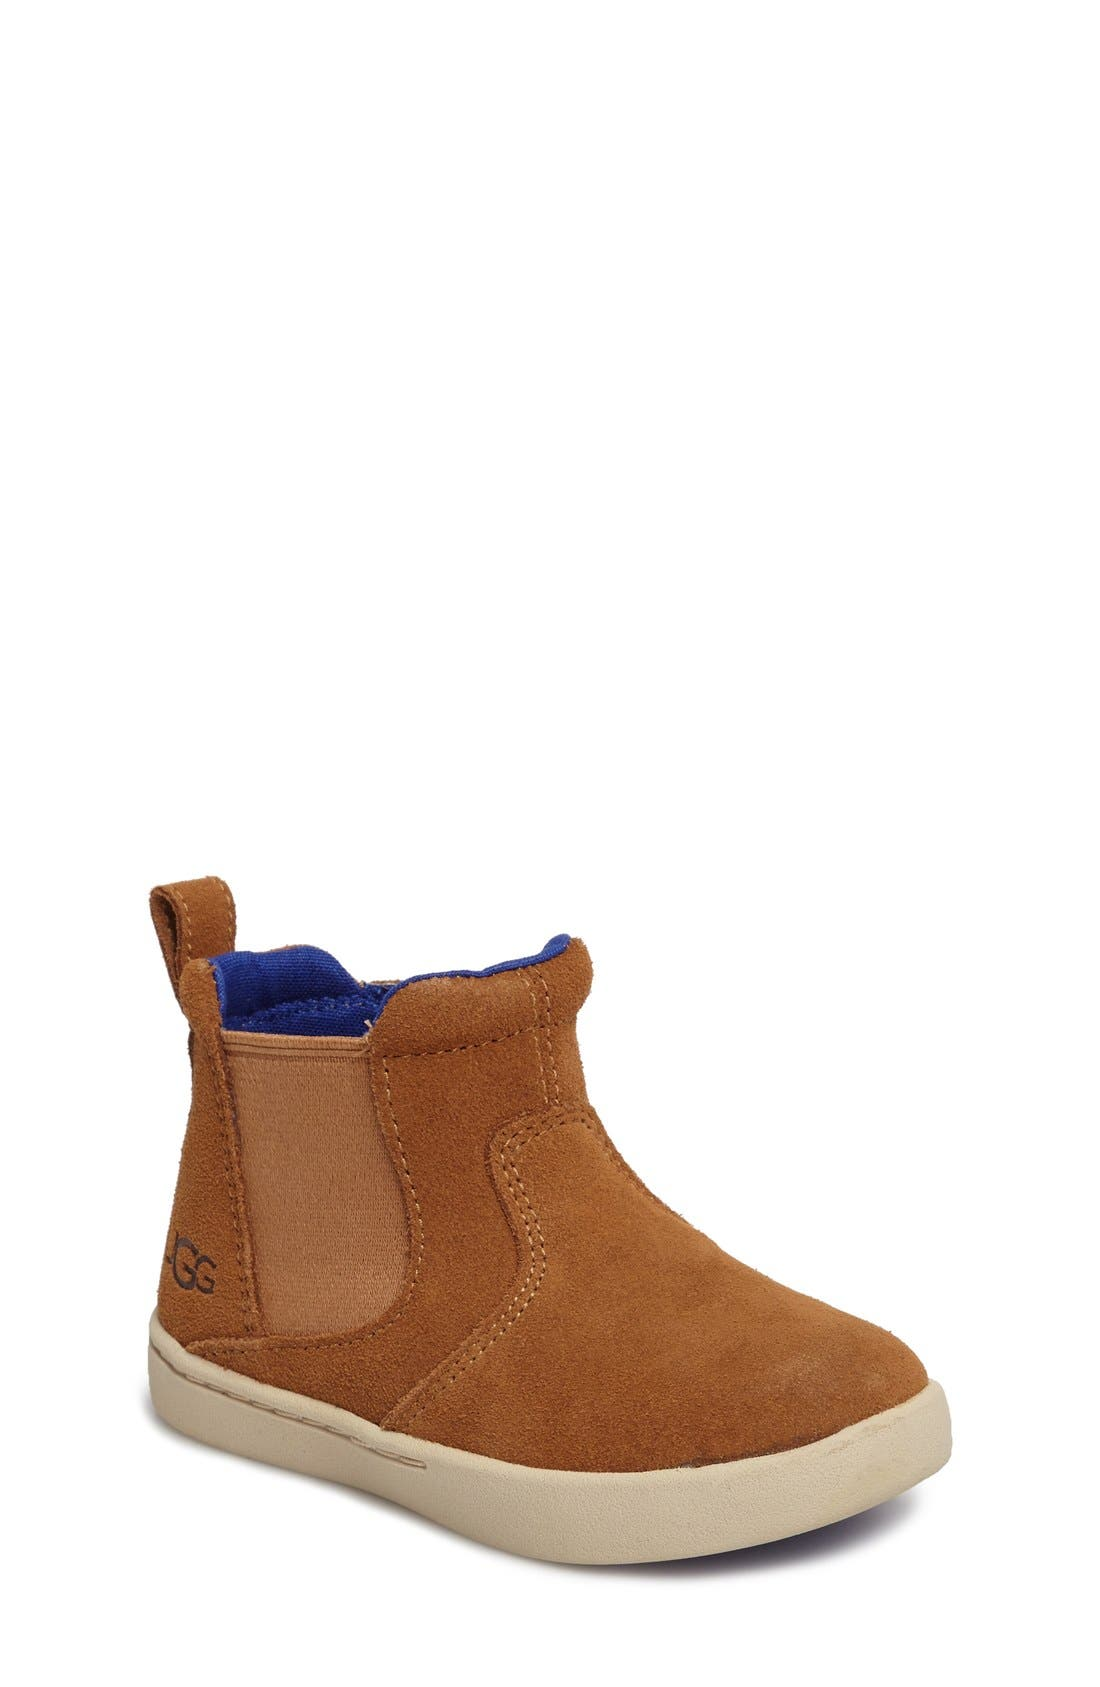 Alternate Image 1 Selected - UGG® Hamden Sneaker (Walker, Toddler, Little Kid & Big Kid)